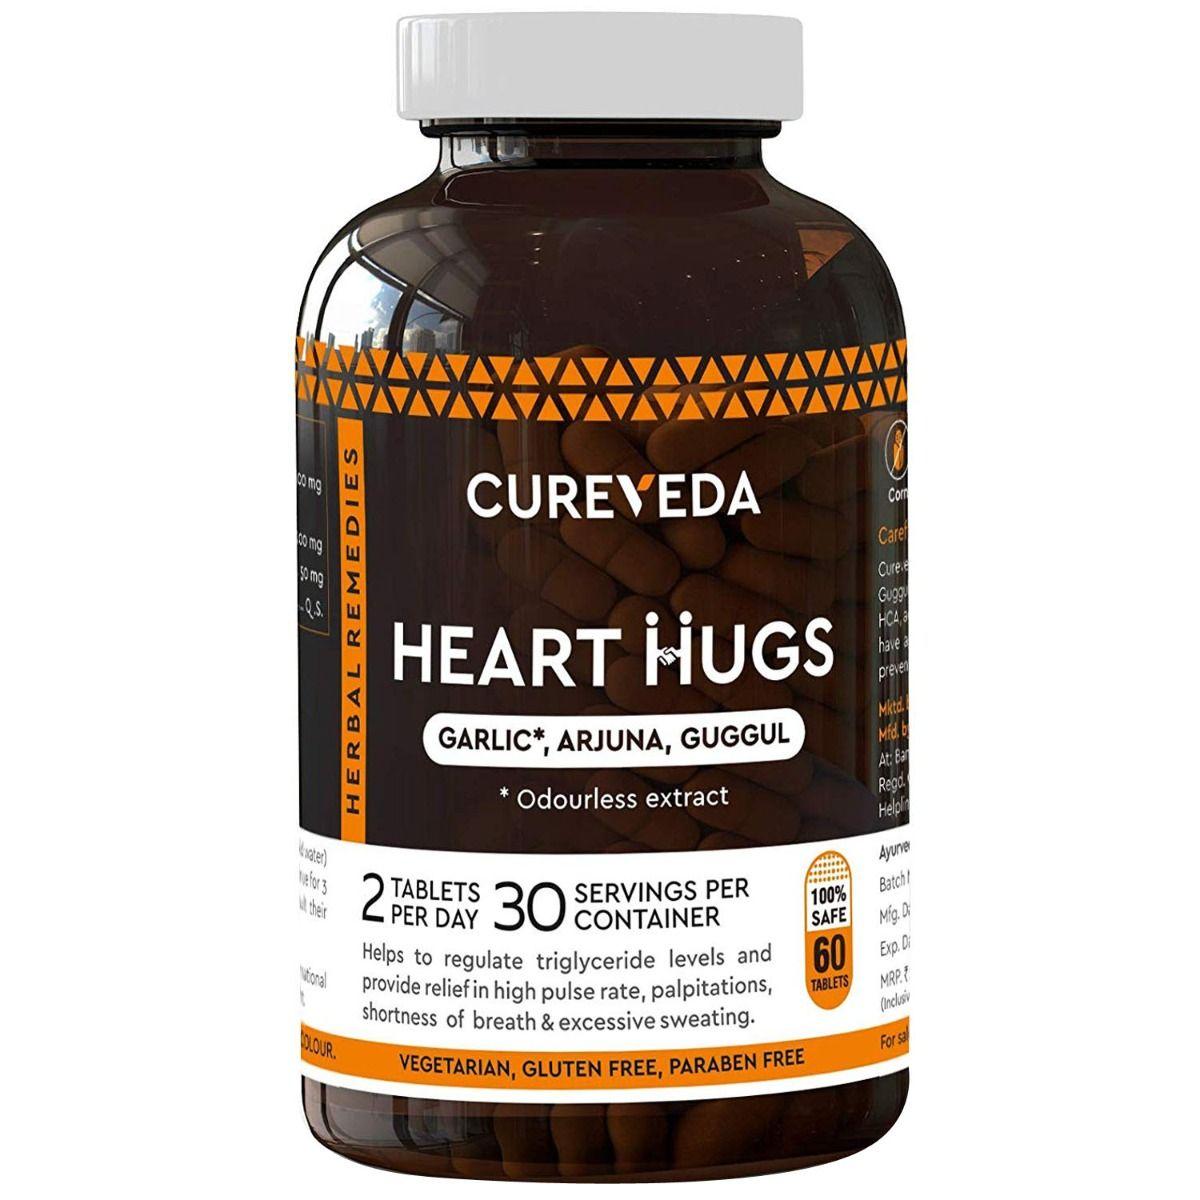 Cureveda Heart Hugs, 60 Tablets